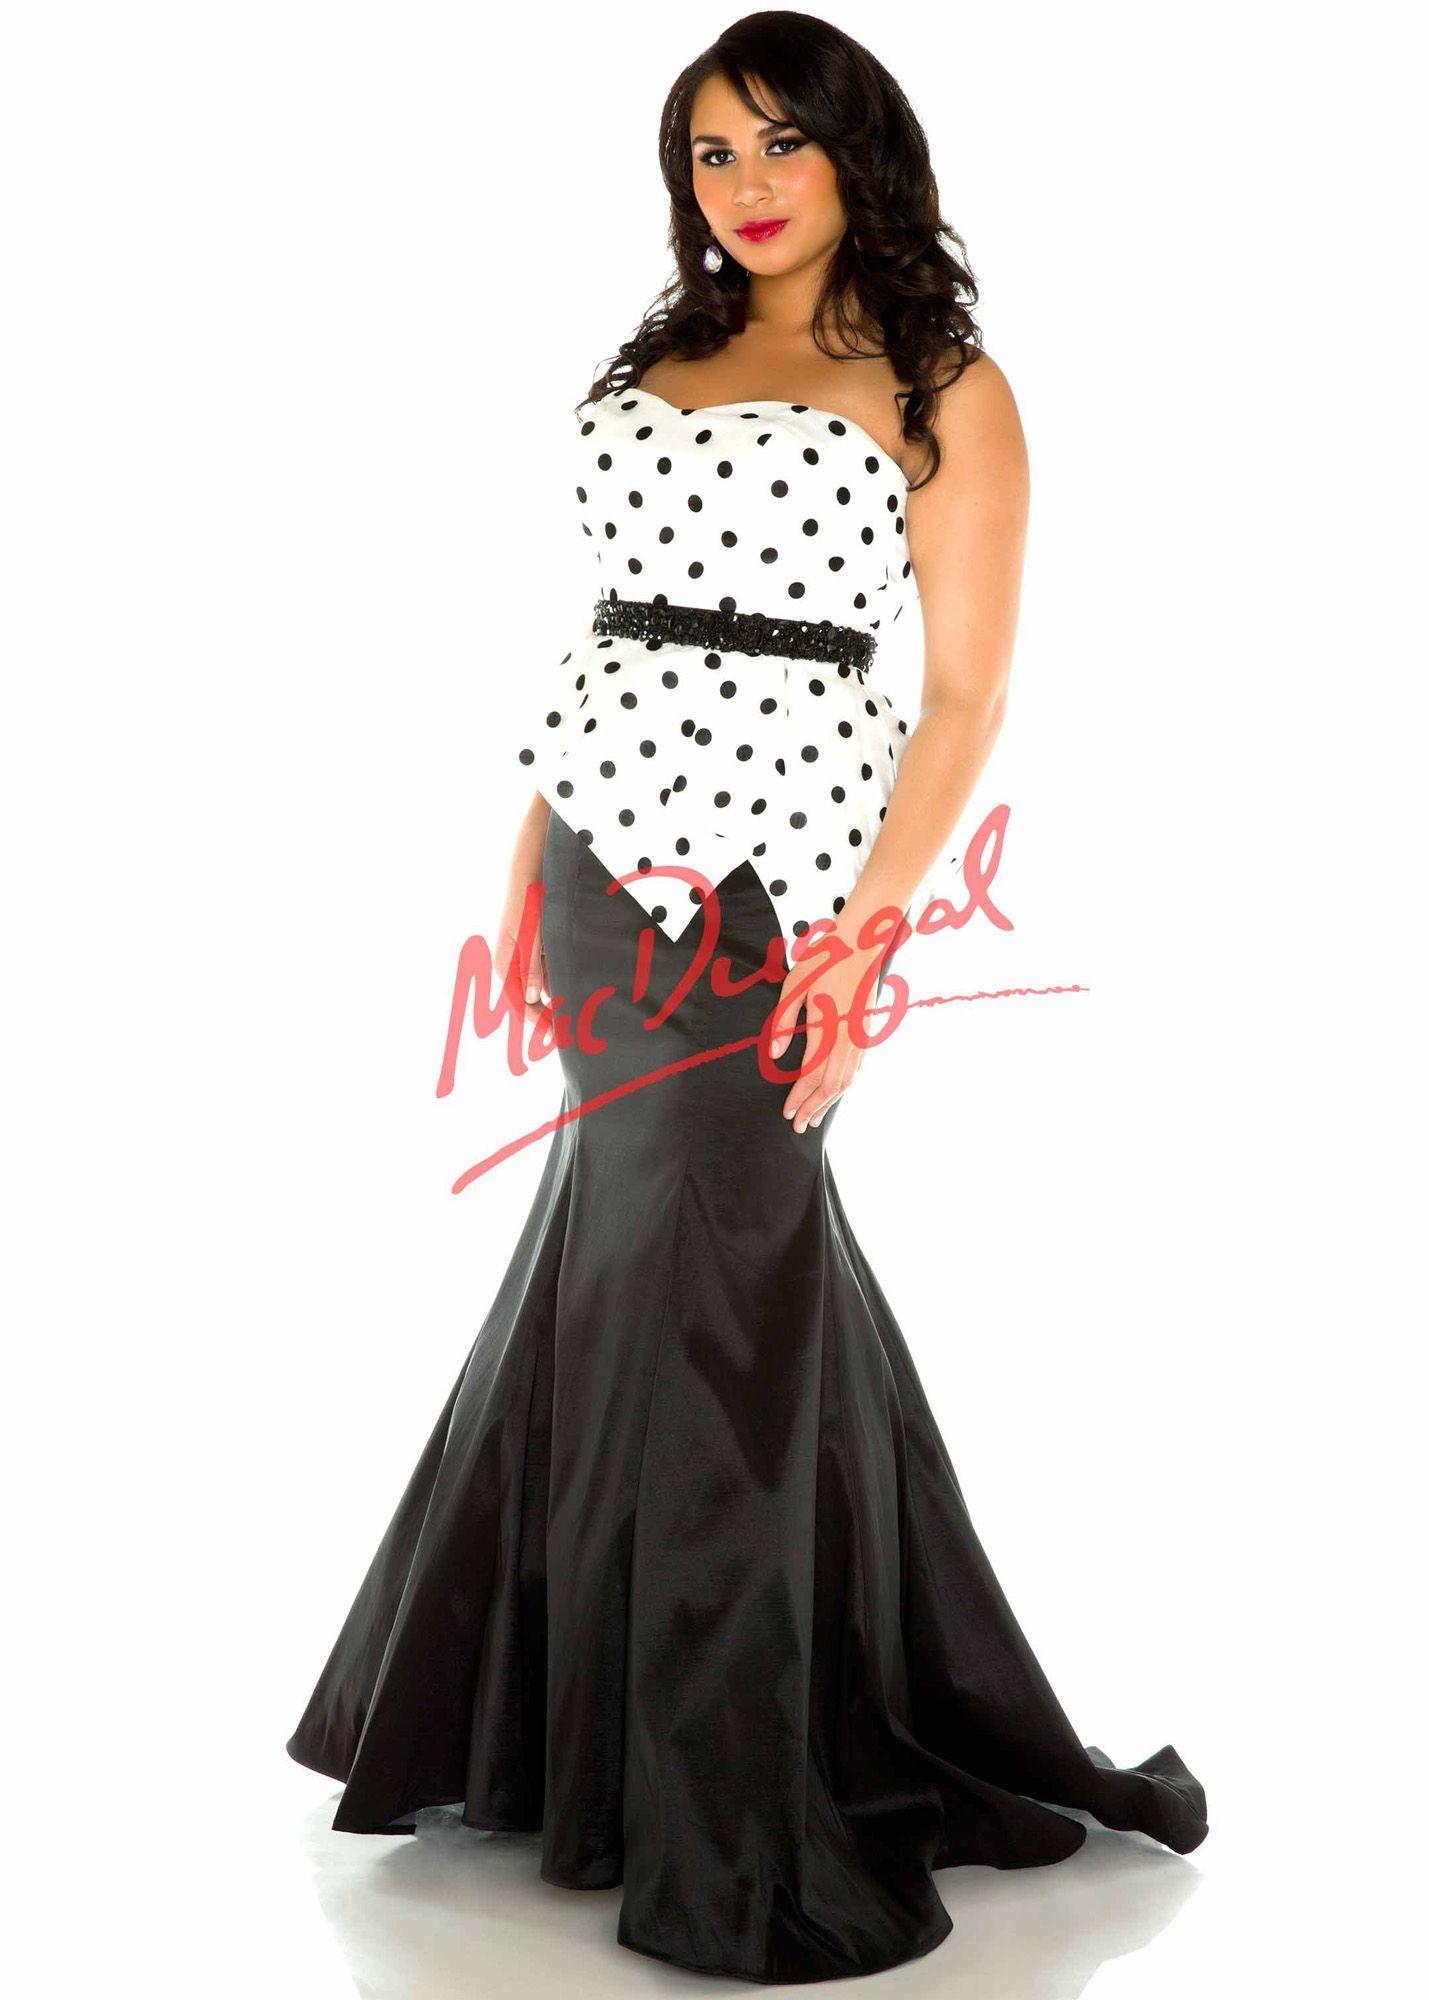 Mac duggal polka dot mermaid plus size prom dresses online